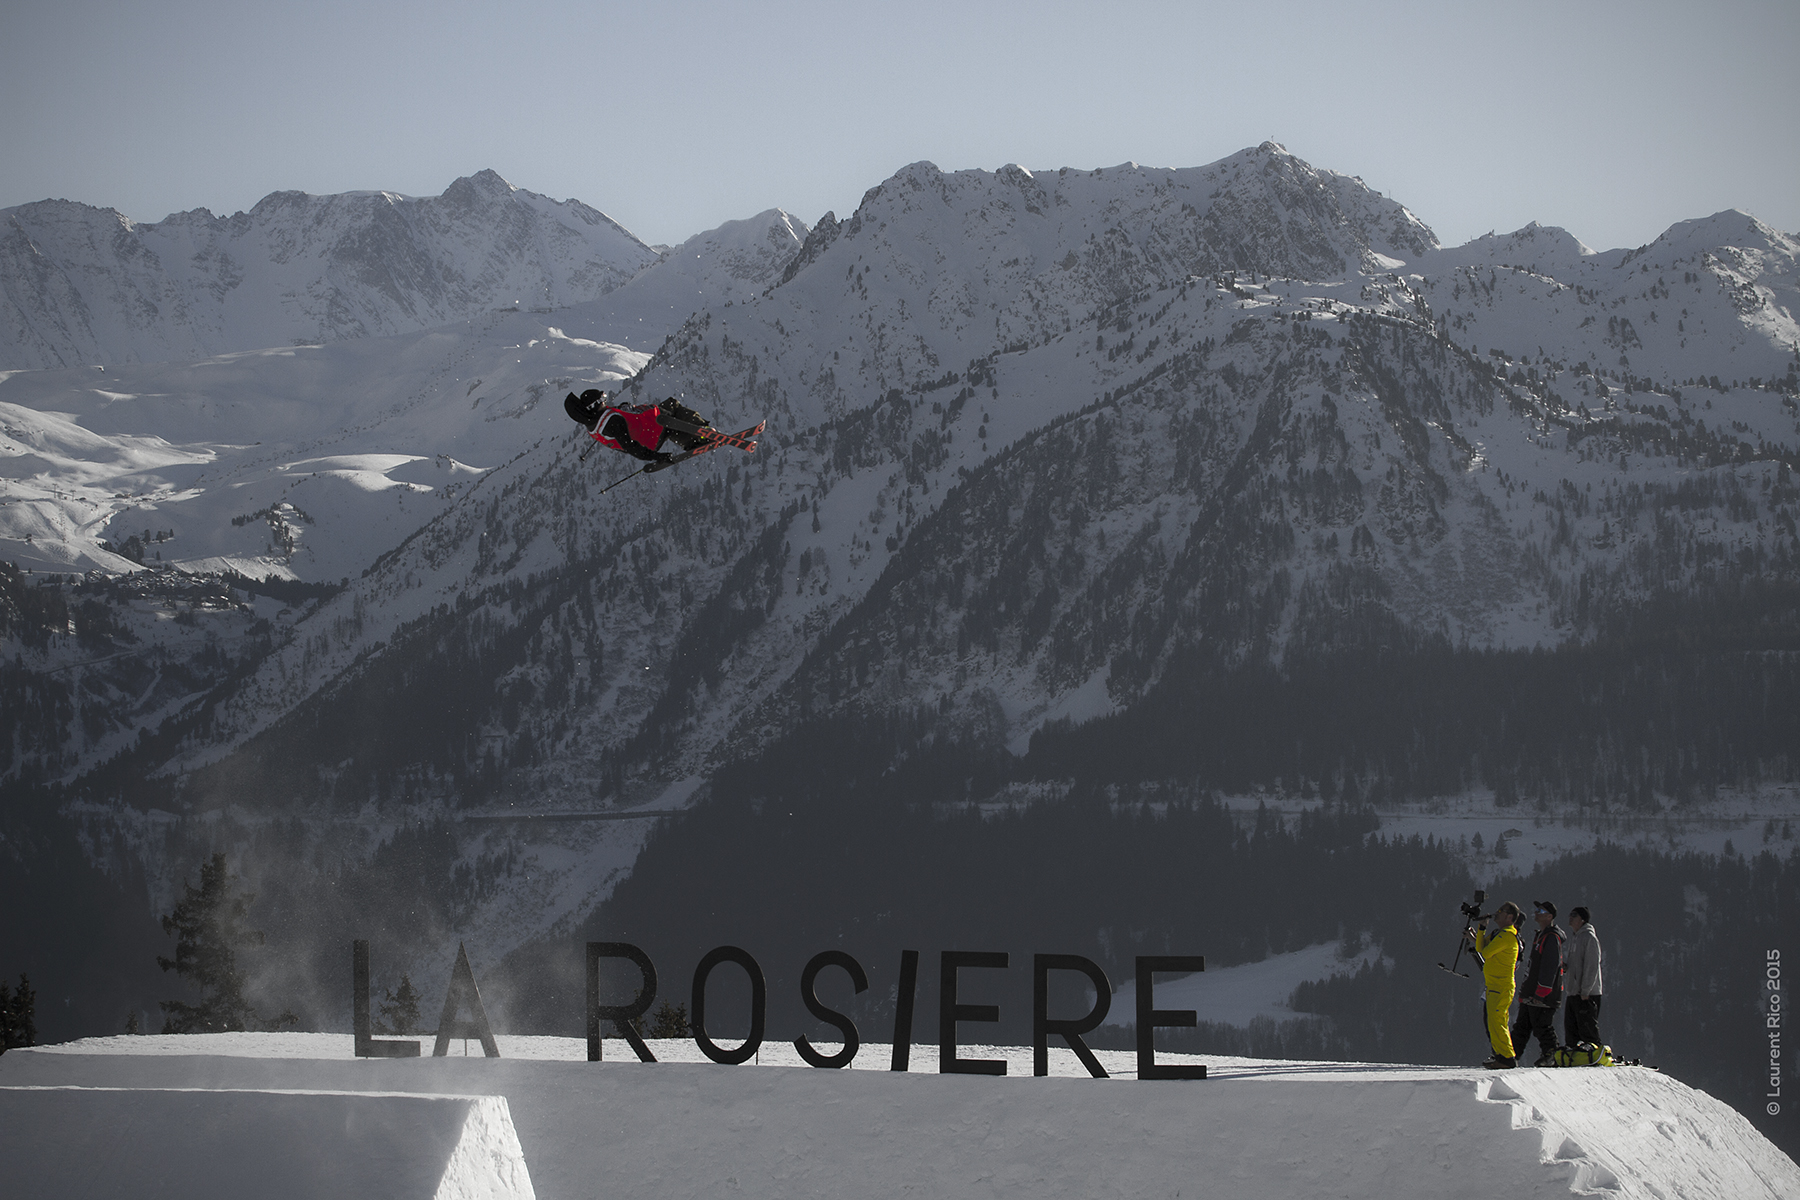 laurent rico-production- photographe-realisateur-reportage-outdoor-evenementiel-freeski-playoffs-la rosiere-stations-savoie-grenoble